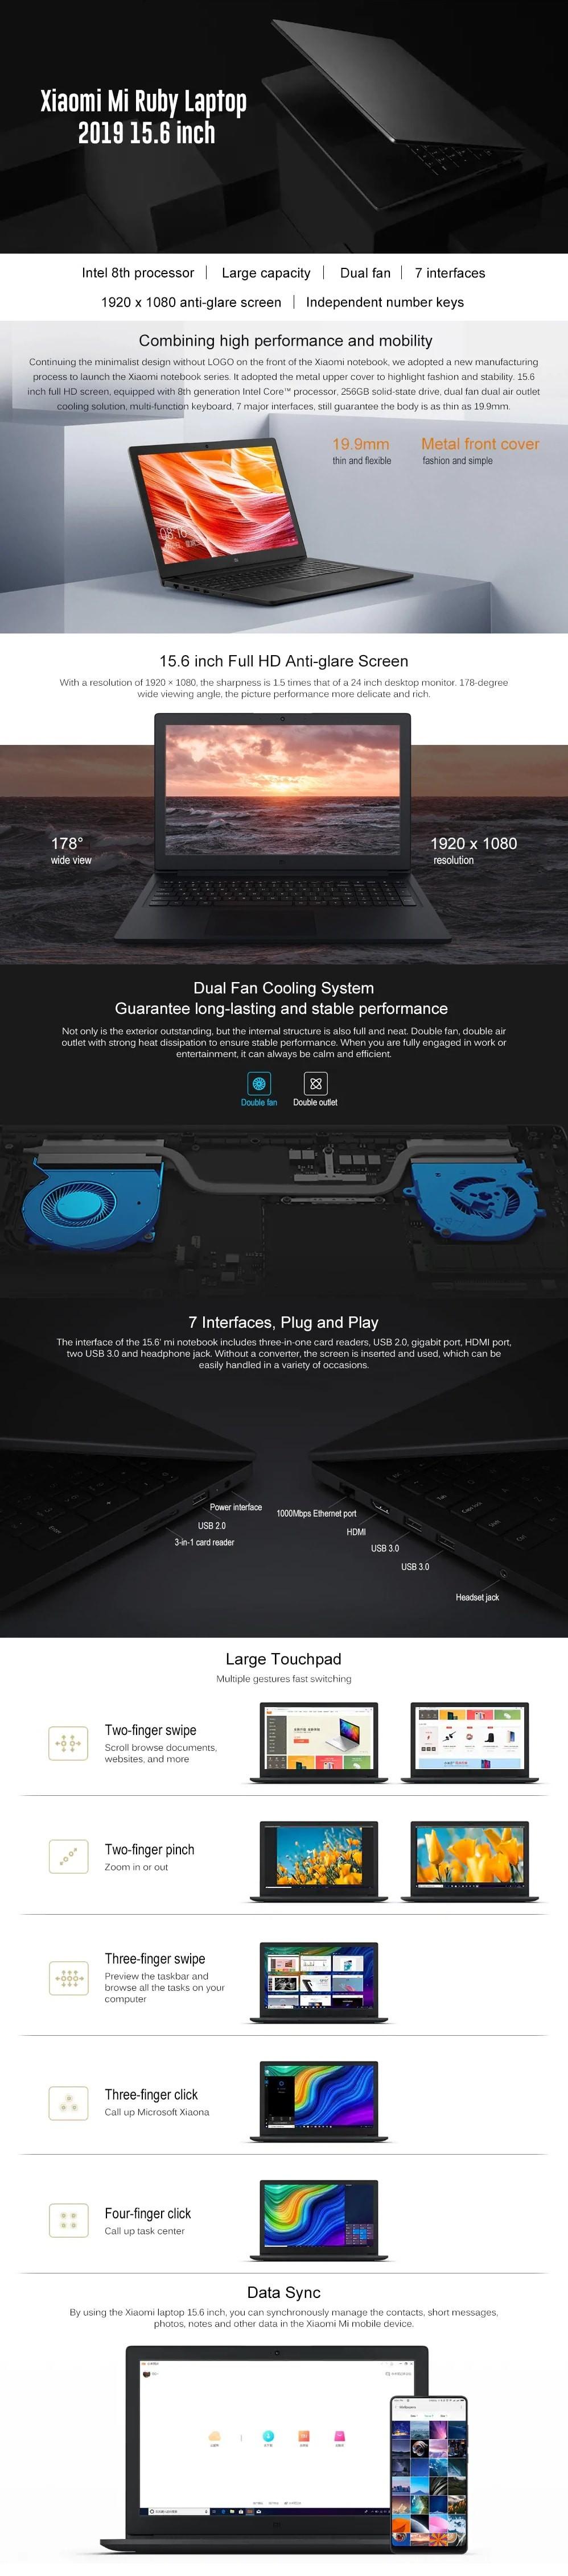 Prezentare-Xiaomi-Mi-Ruby-Air-i5-8-256856ed8ac99d7ba4c.jpg